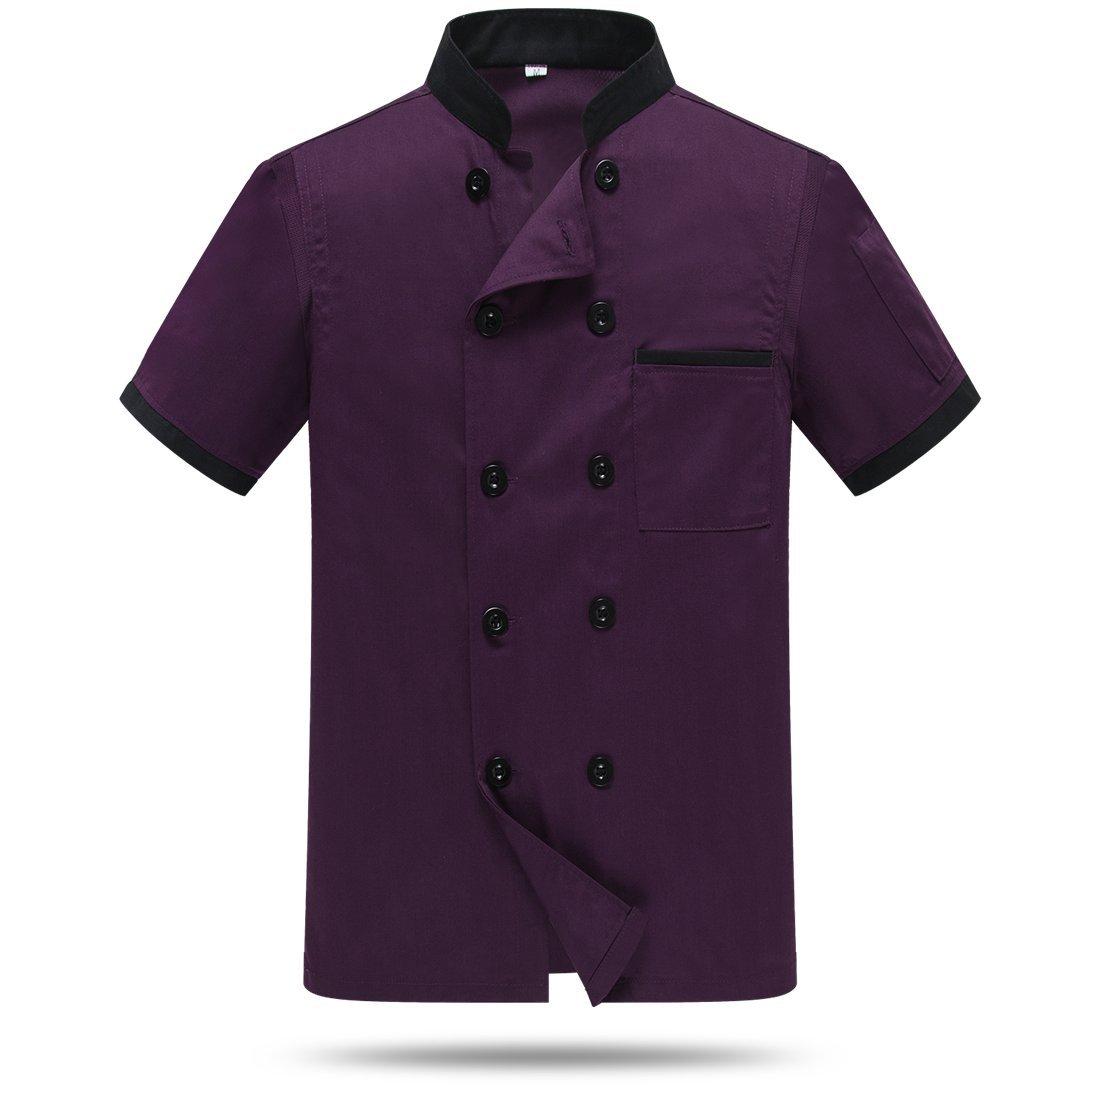 WAIWAIZUI Chef Jackets Waiter Coat Short Sleeves Back and Underarm Mesh Size S (Label:XL) Purple